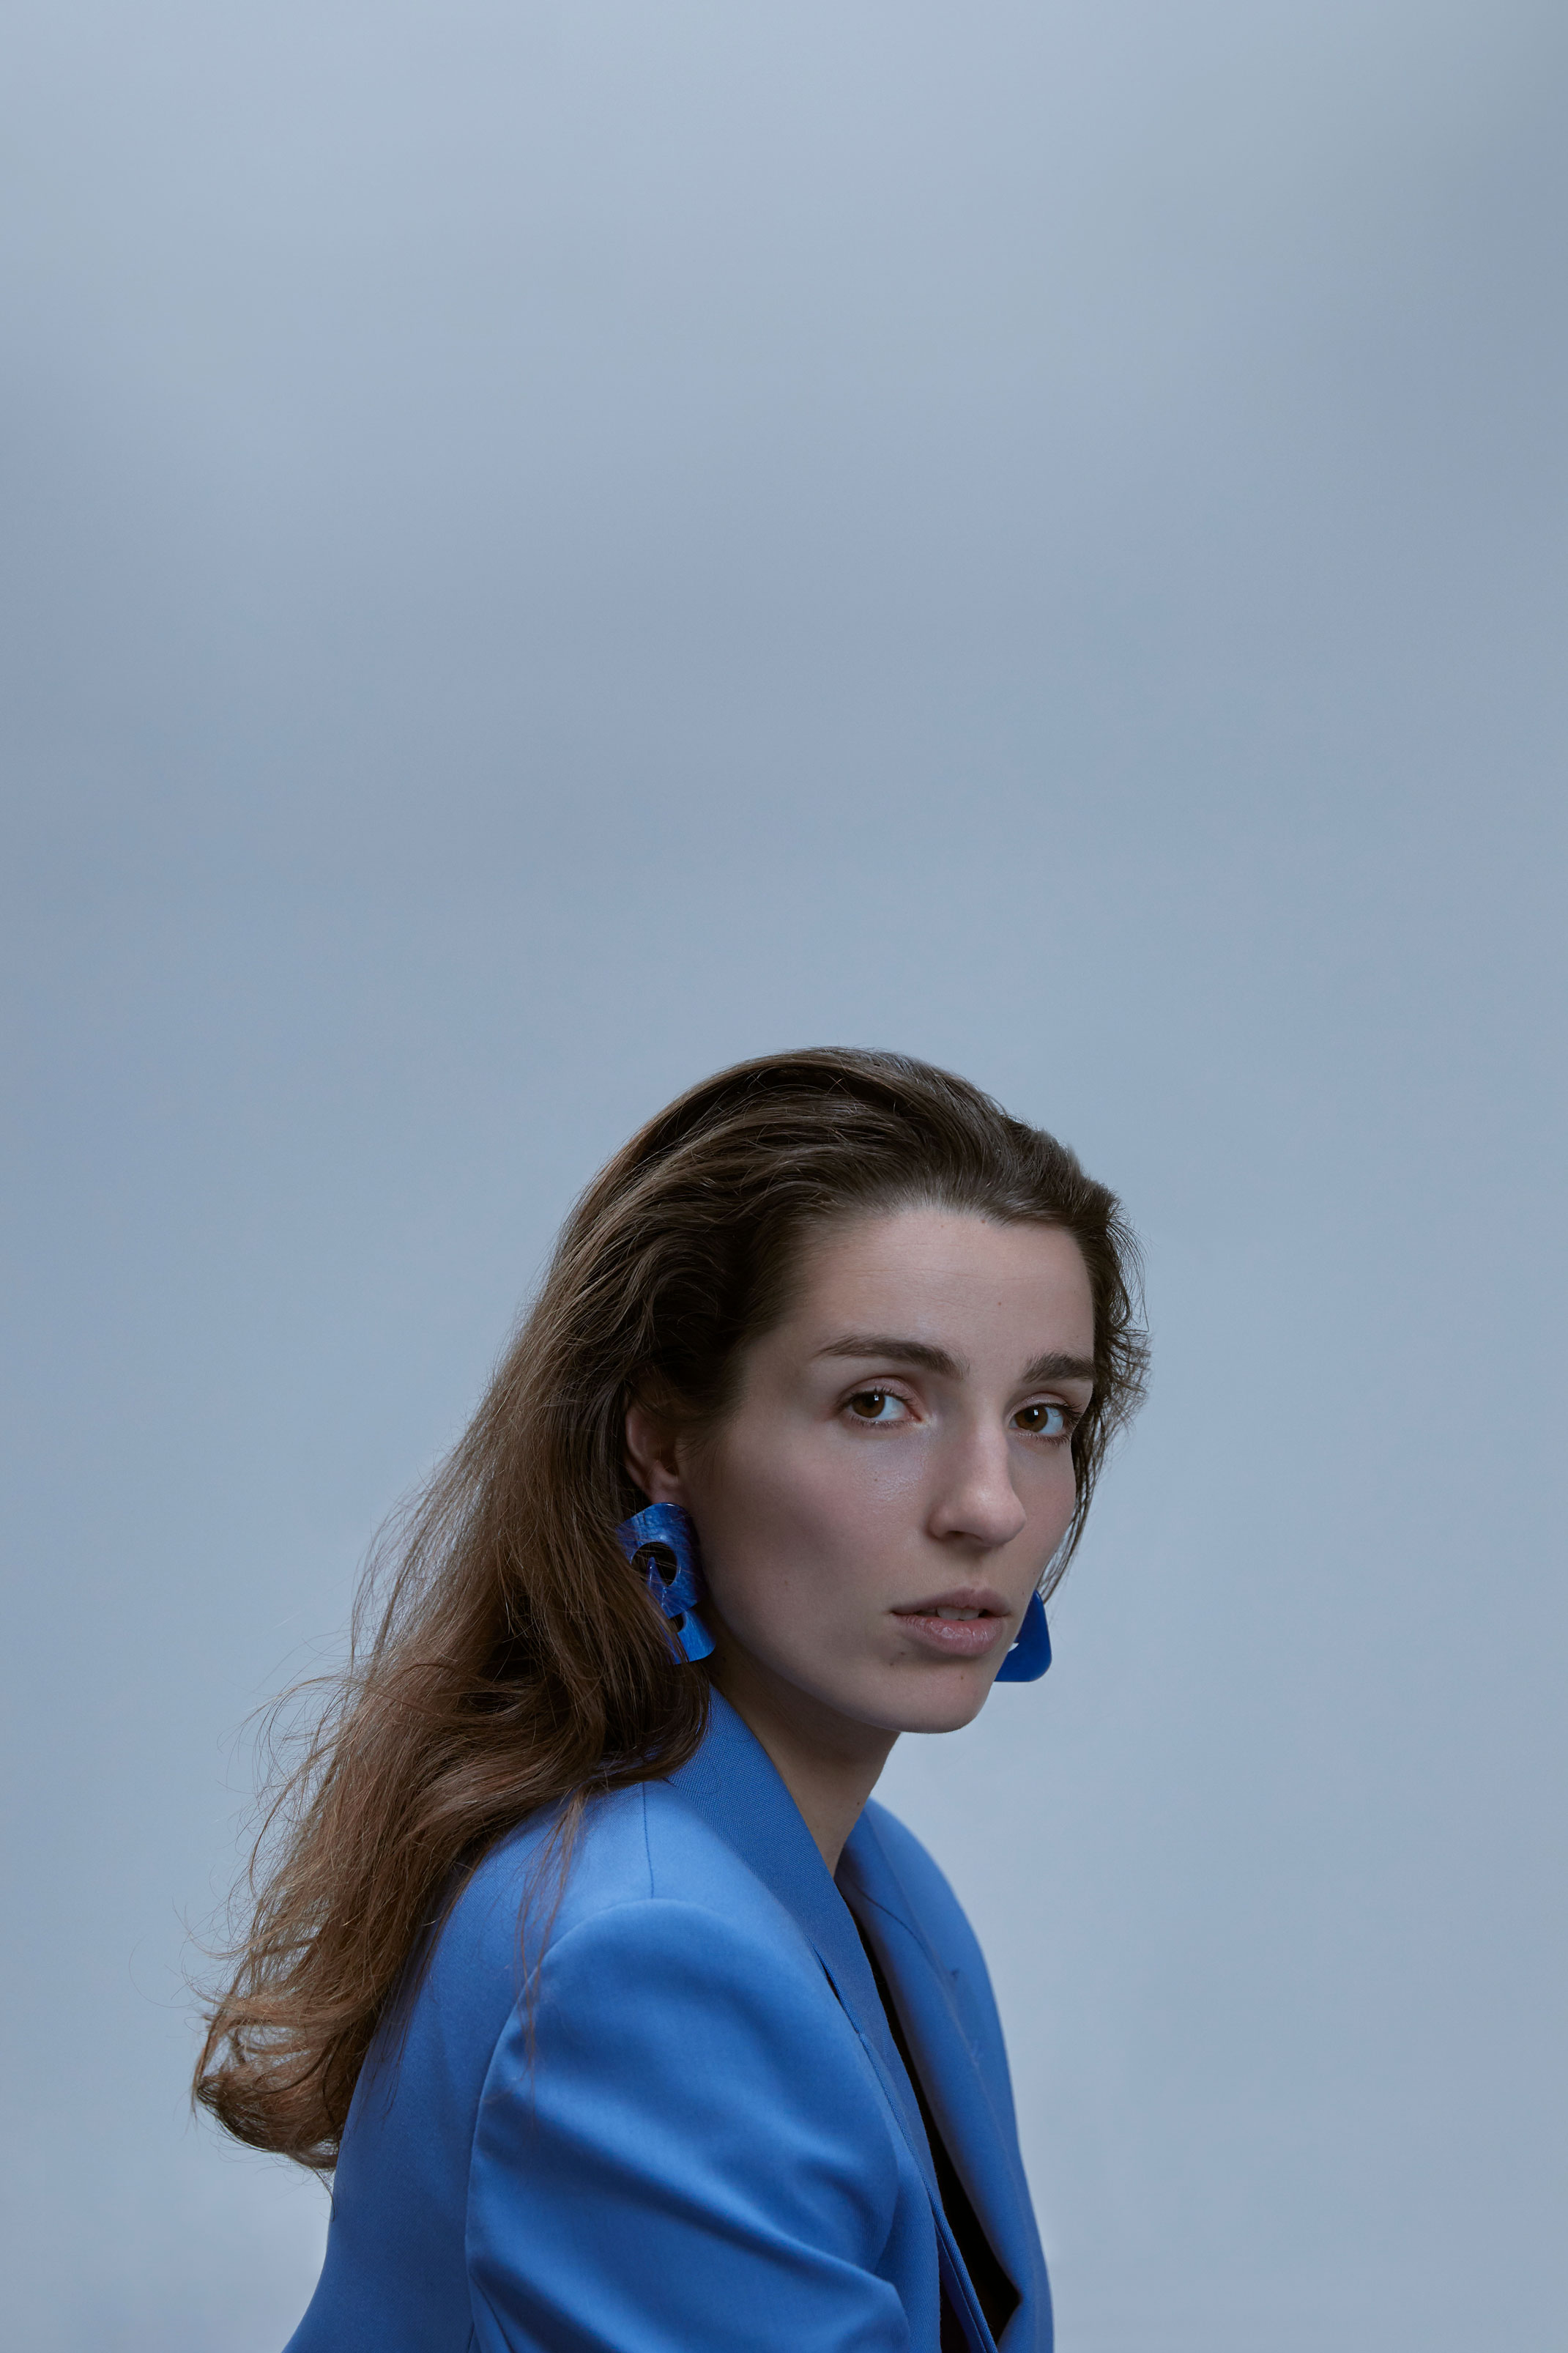 photographe portrait presse bretagne